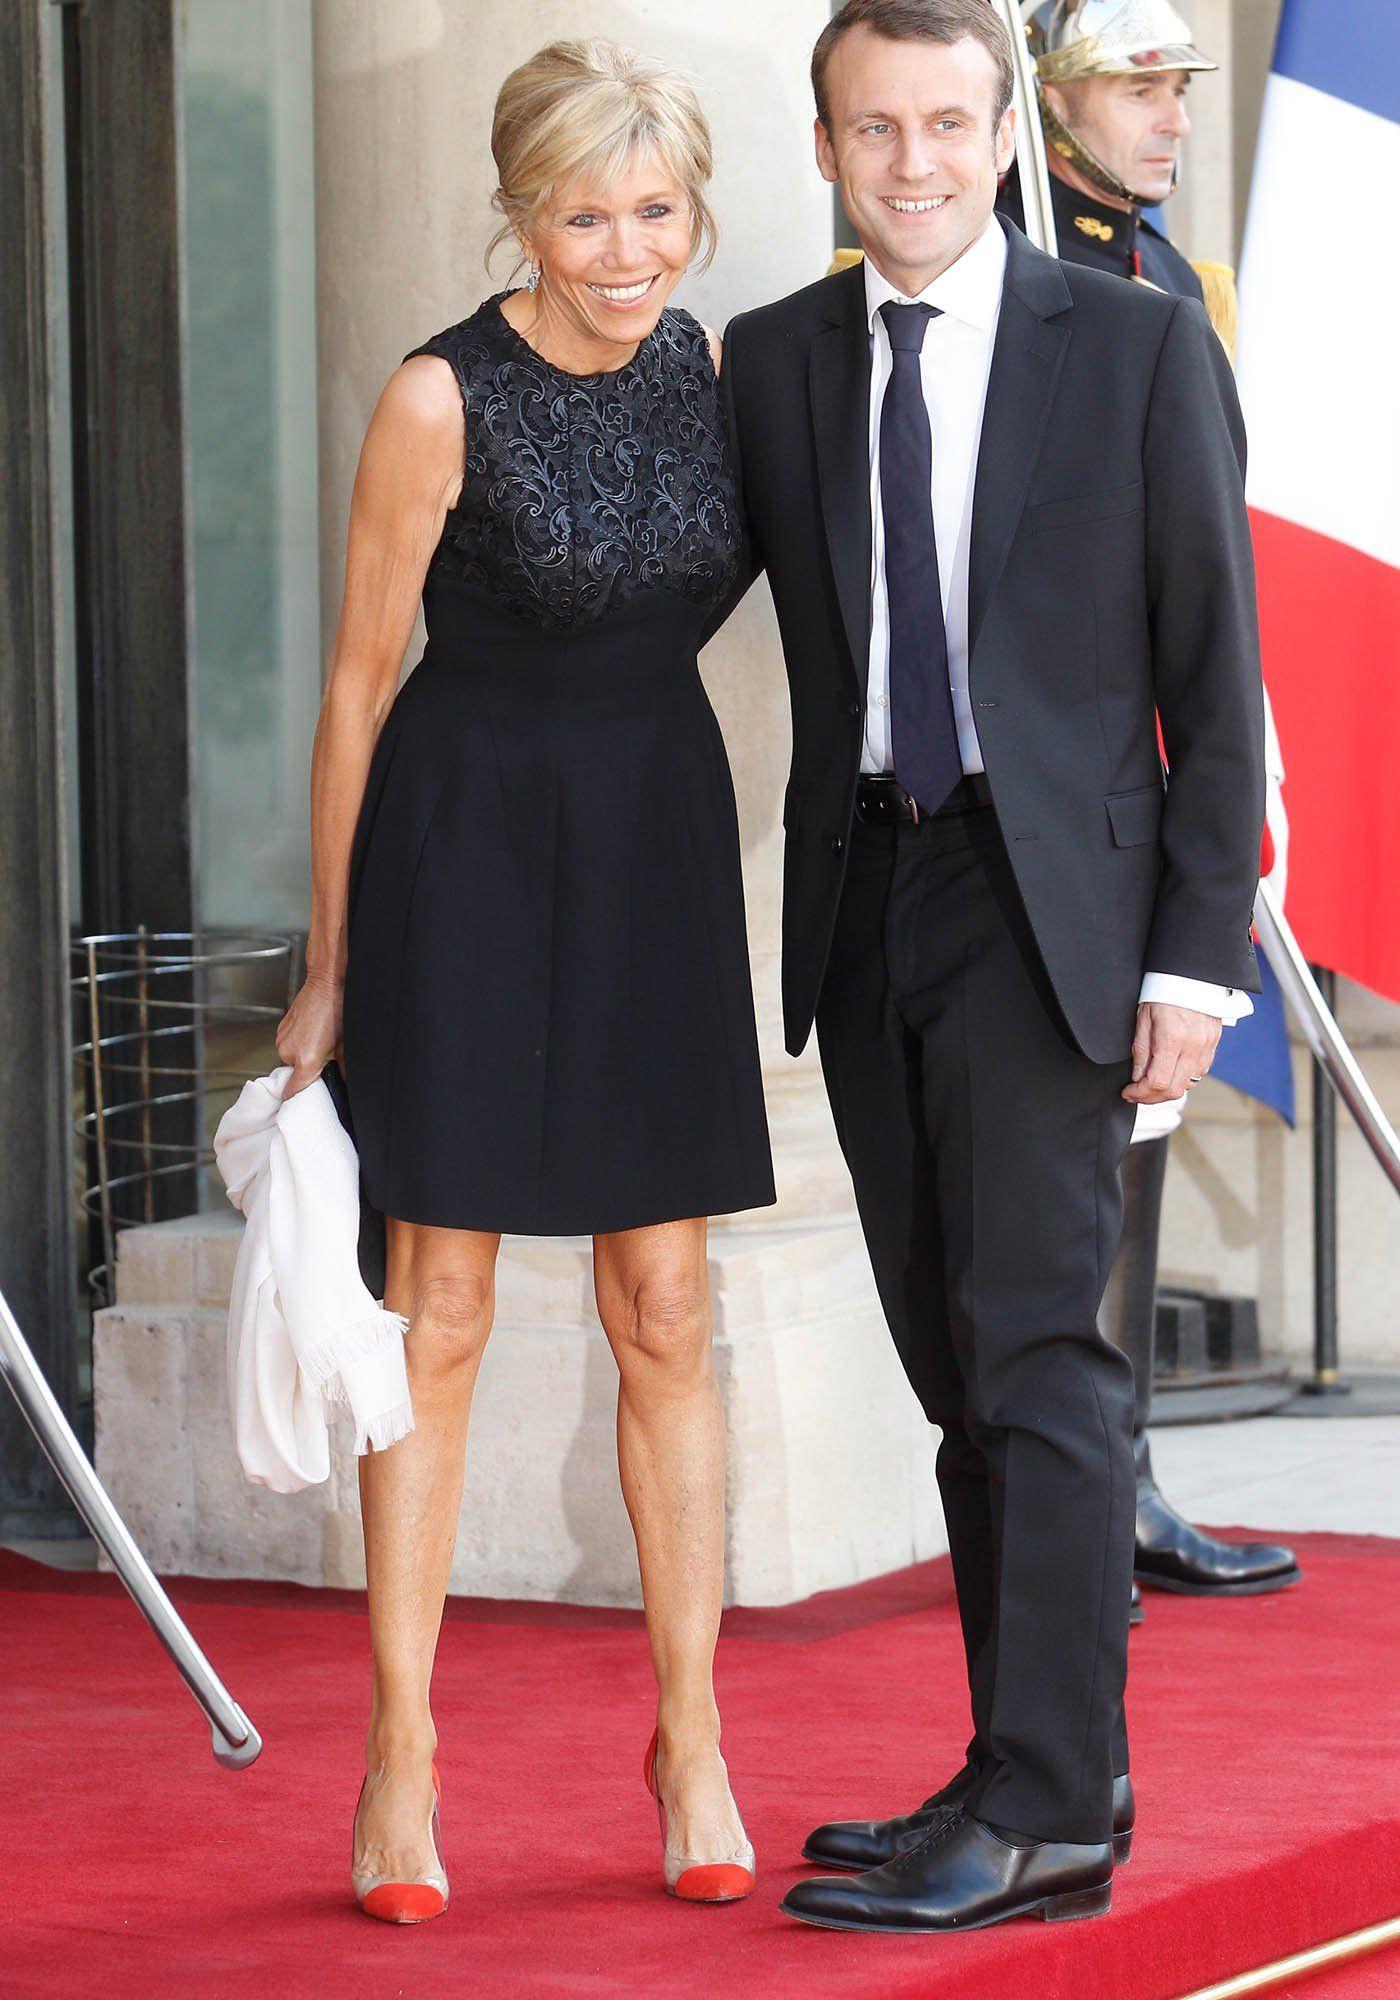 Brigitte Trogneux 24 Years Older Than Her Husband Et